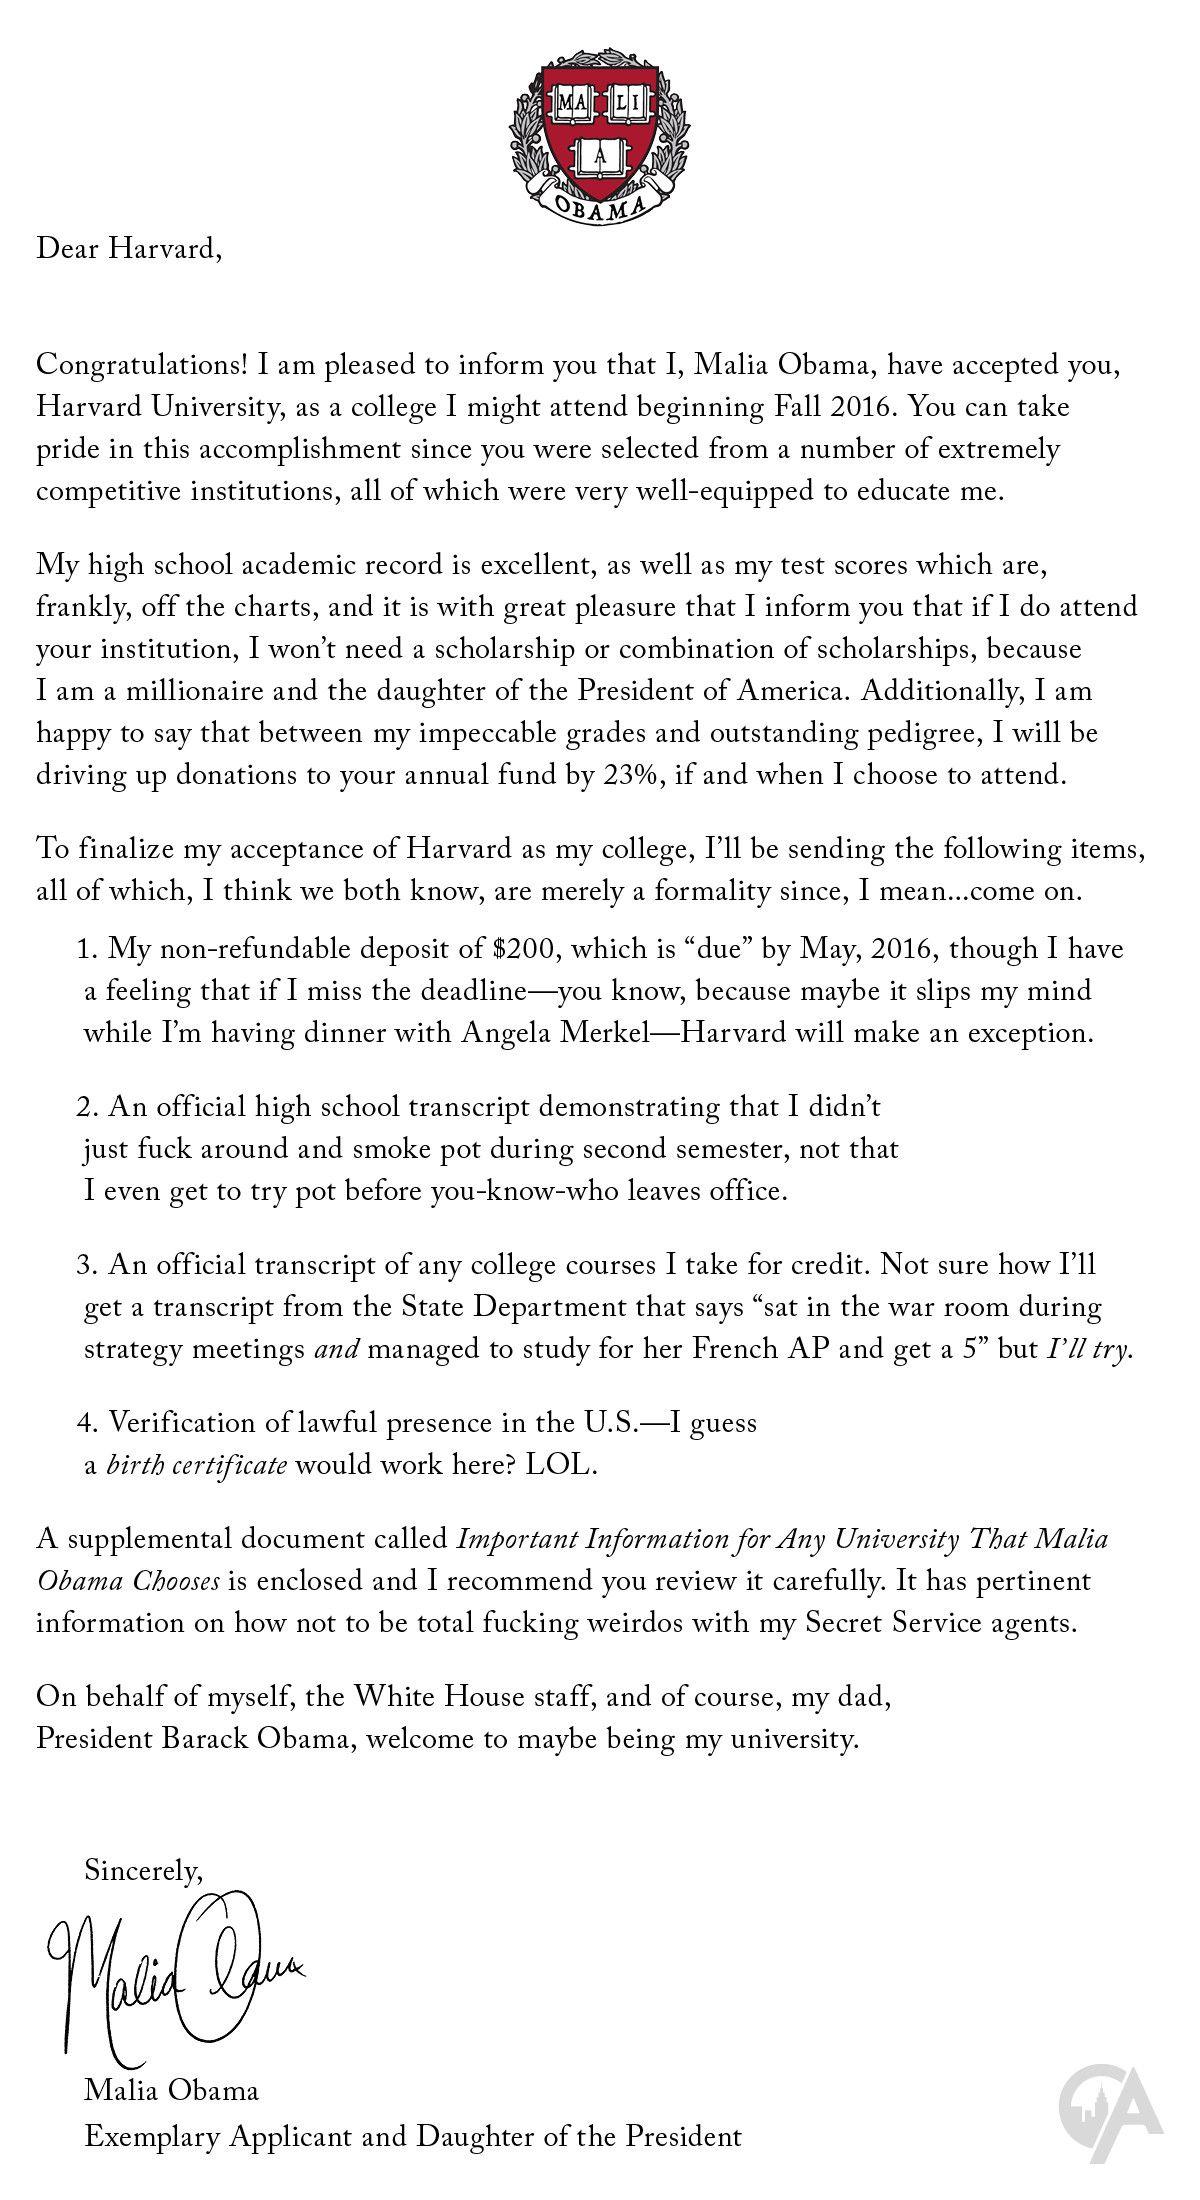 University Acceptance Letter Sample Luxury Malia Obama Sends